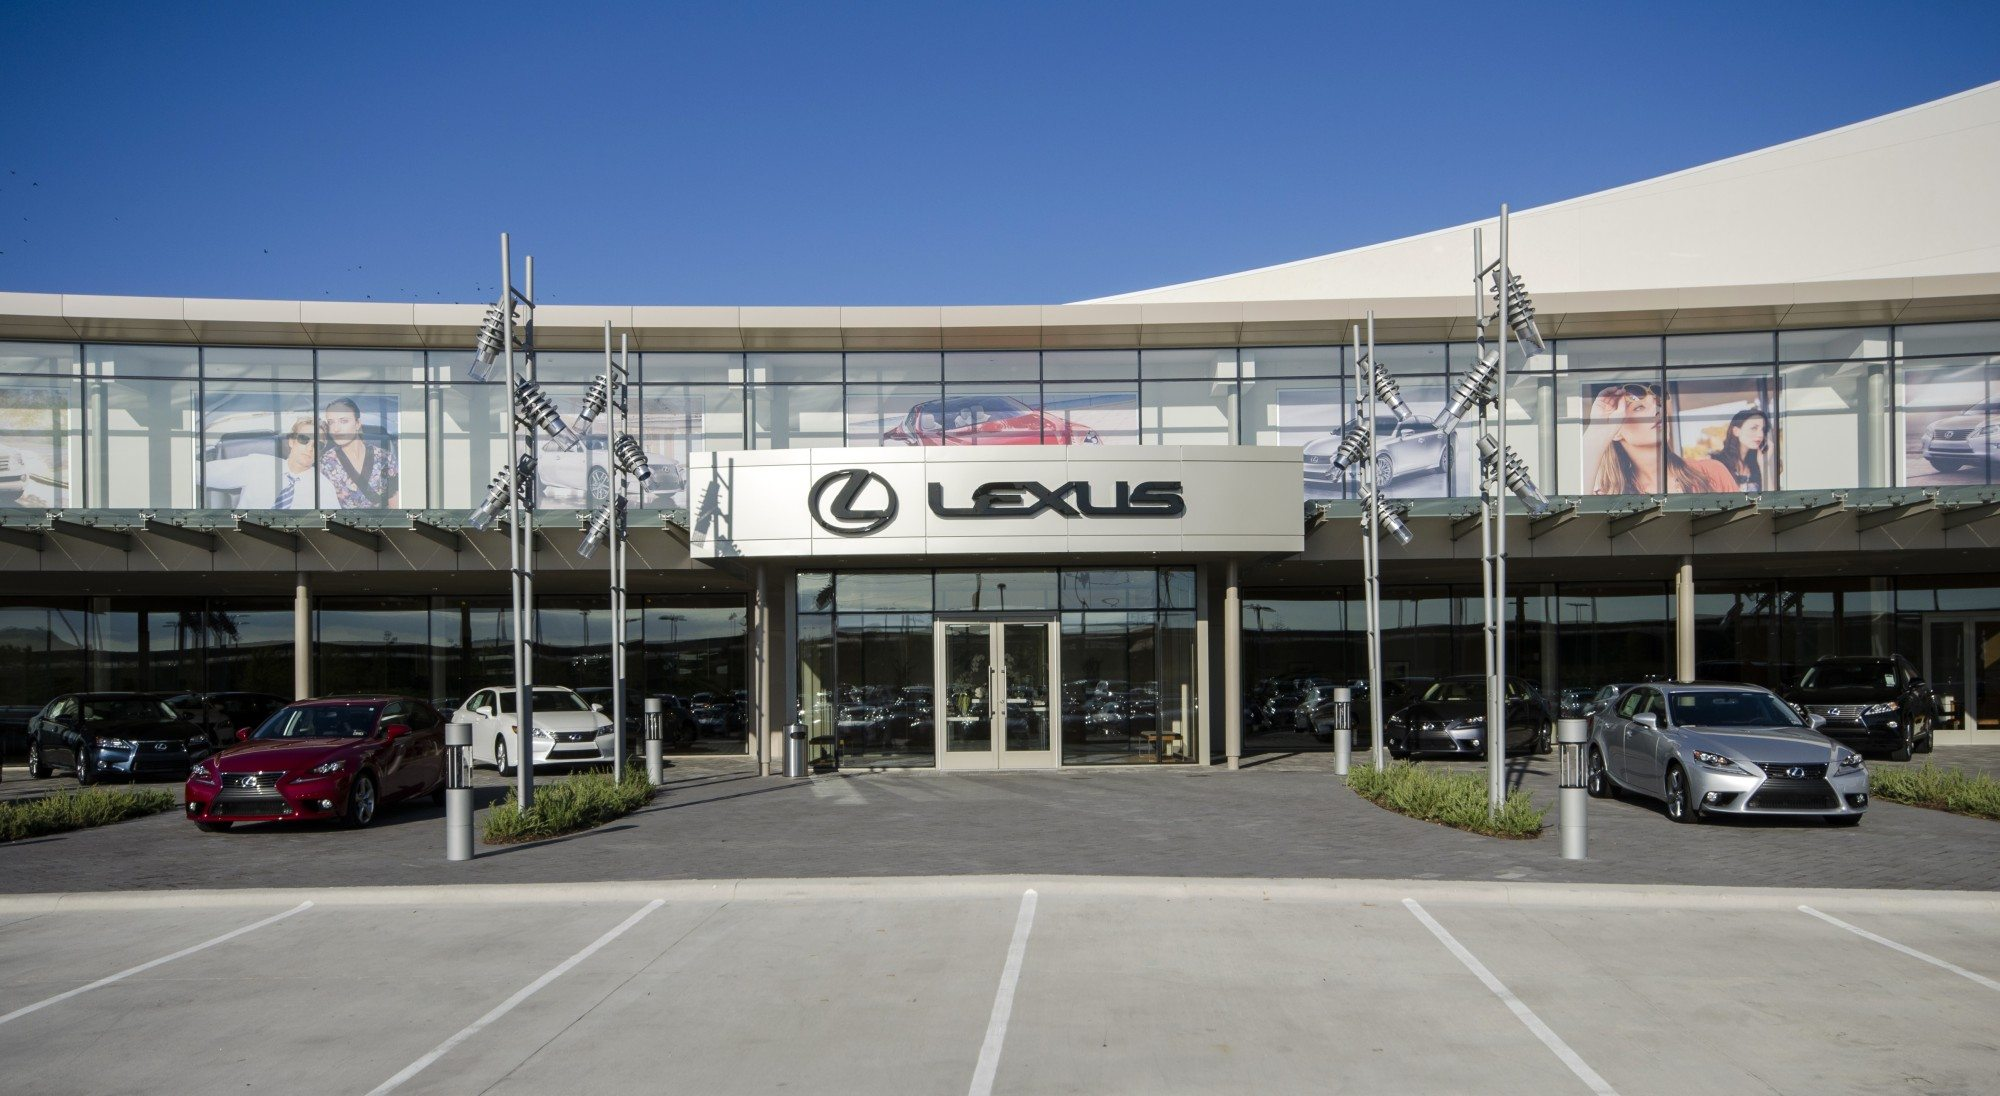 New Lexus Dealerships In Dfw Honda Civic And Accord Gallery Honda Civic And Accord Gallery